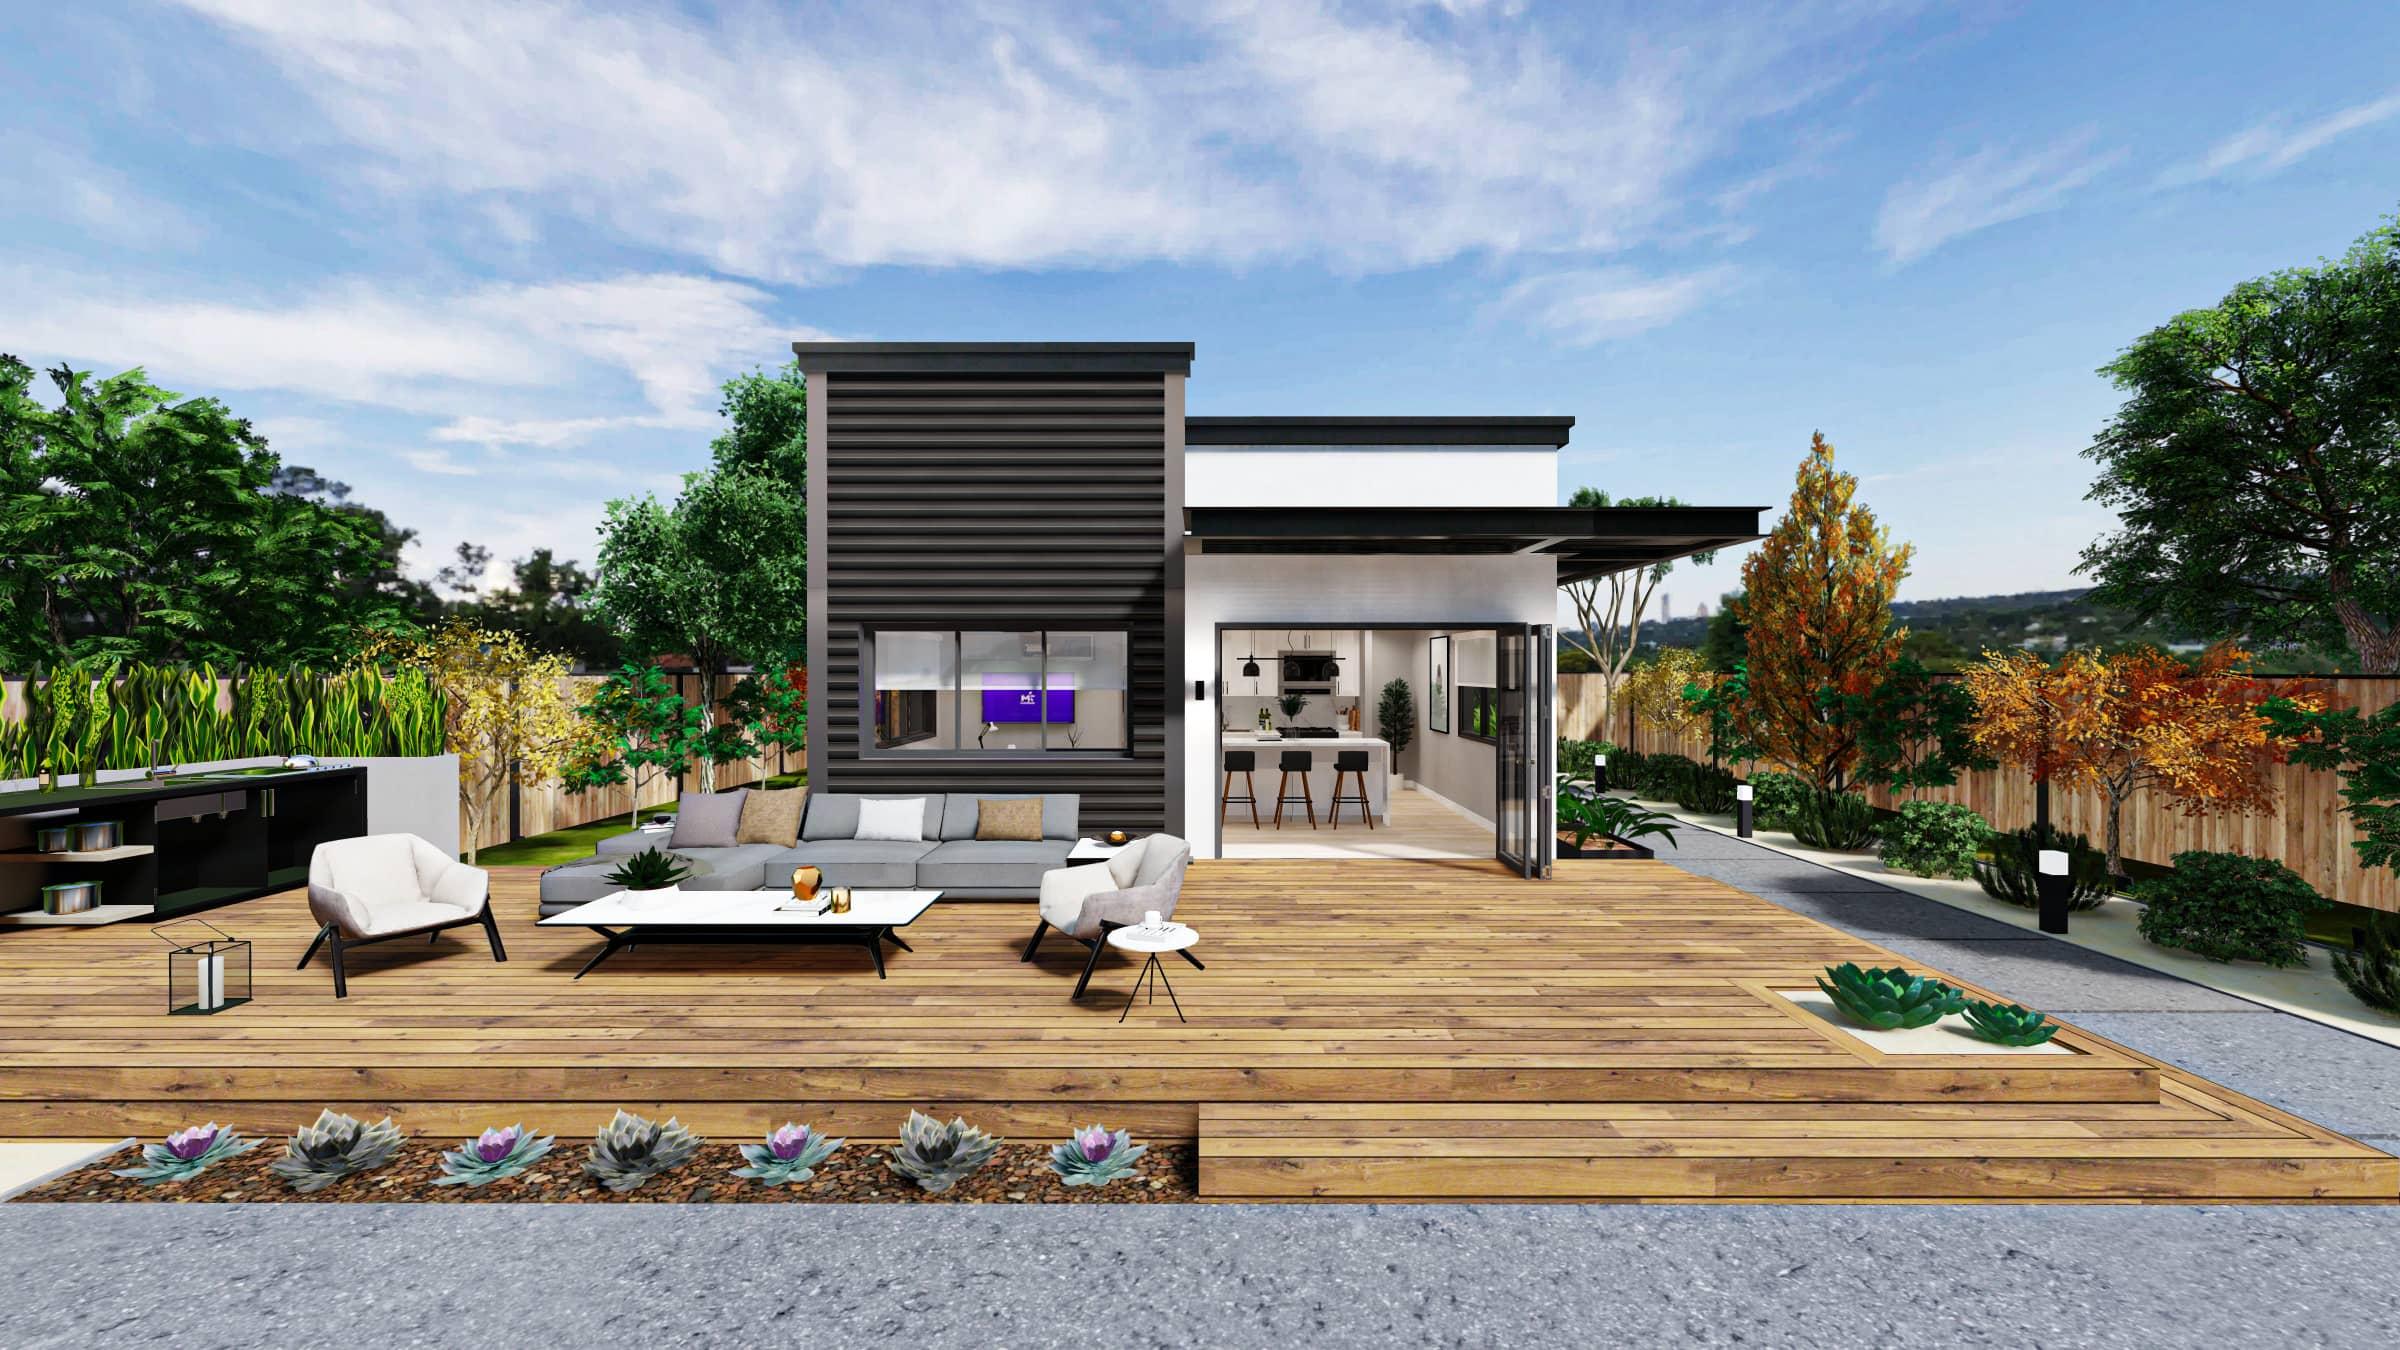 Detached Premium ADU 650 square feet for ADU Catalog by Multitaskr in San Diego County